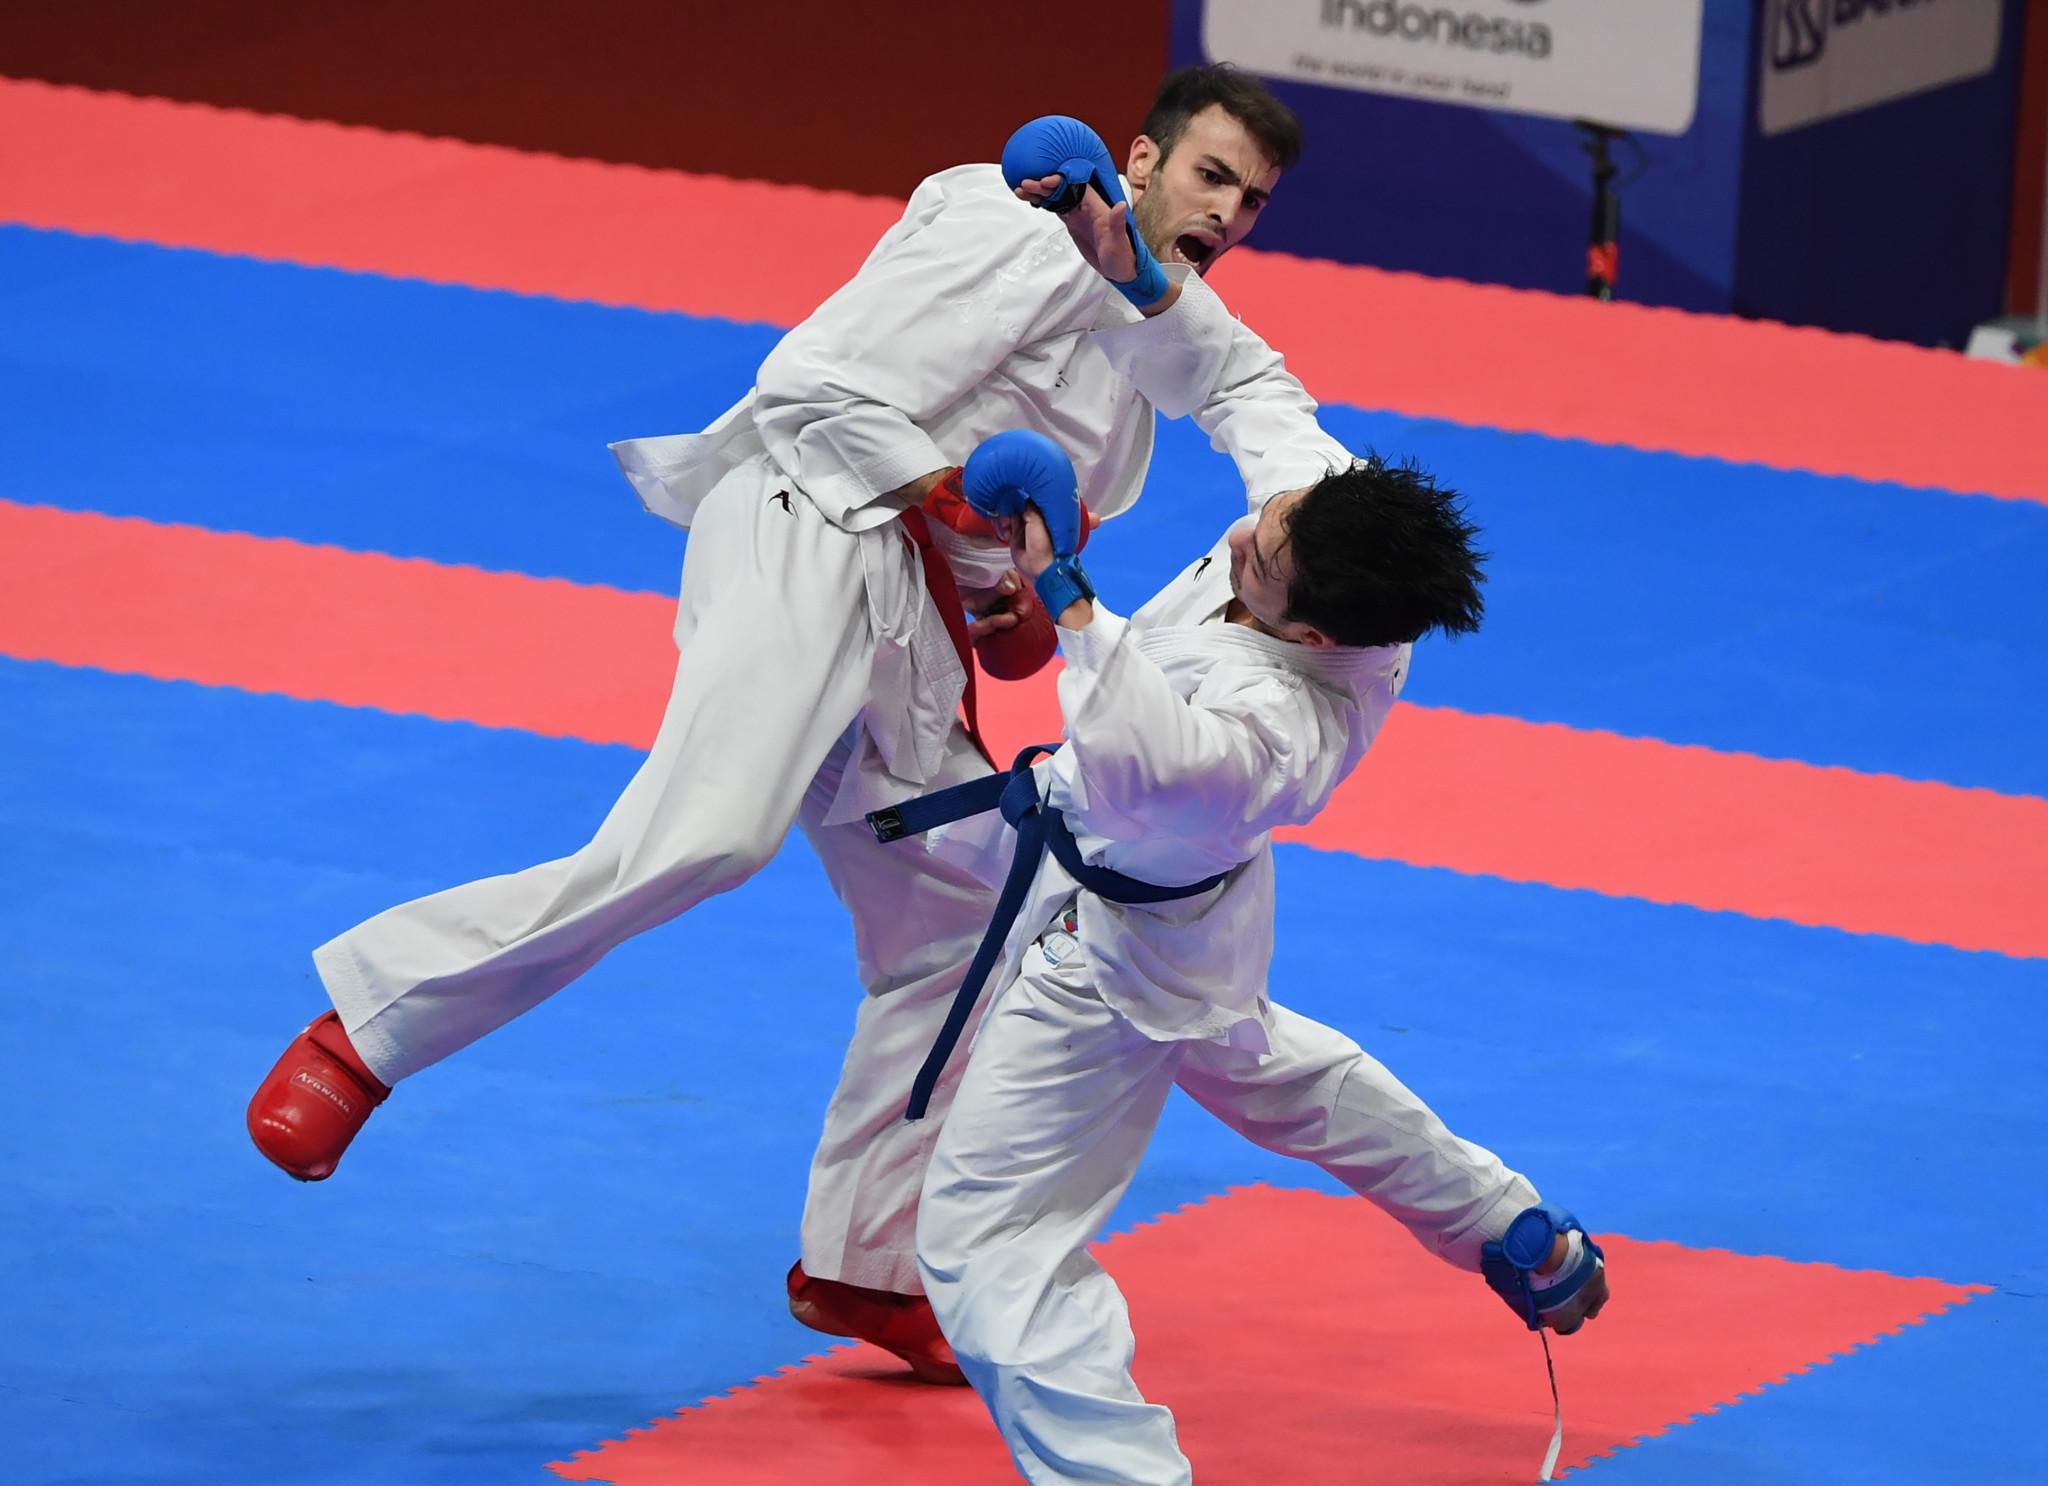 Iran's Bahman Asgari Ghoncheh won the men's under-75kg karate final by ippon ©Getty Images